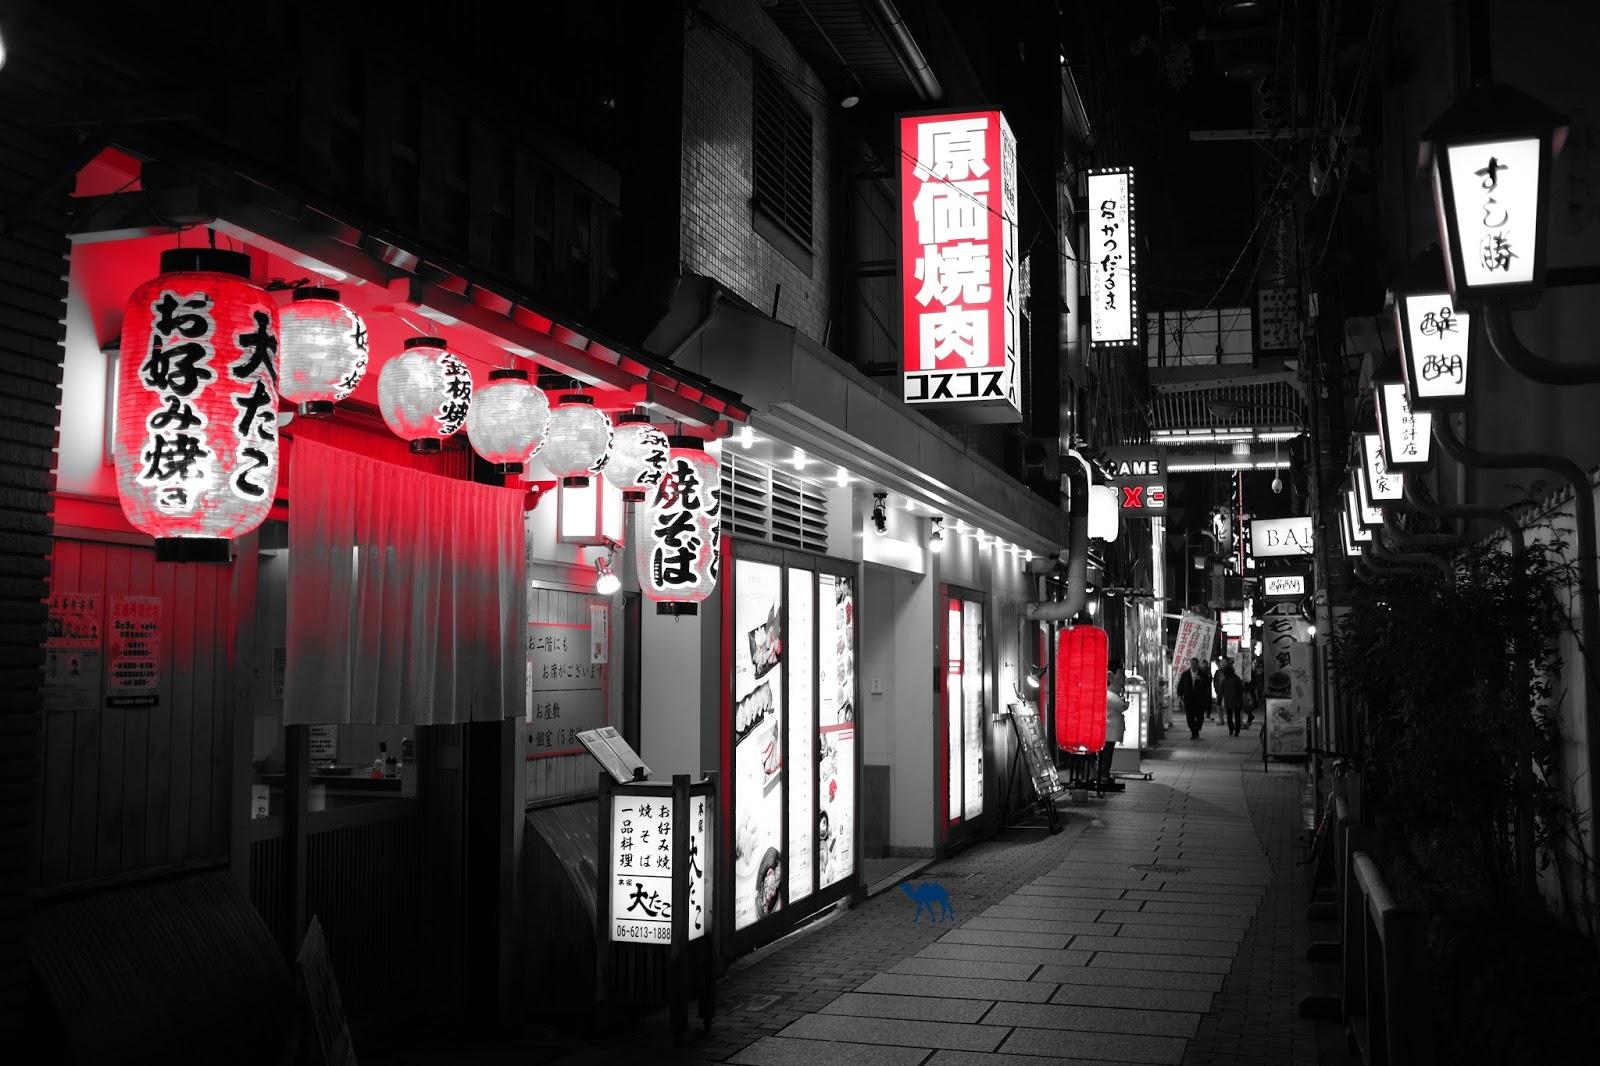 Le Chameau Bleu - Lanternes Rouges d'Osaka